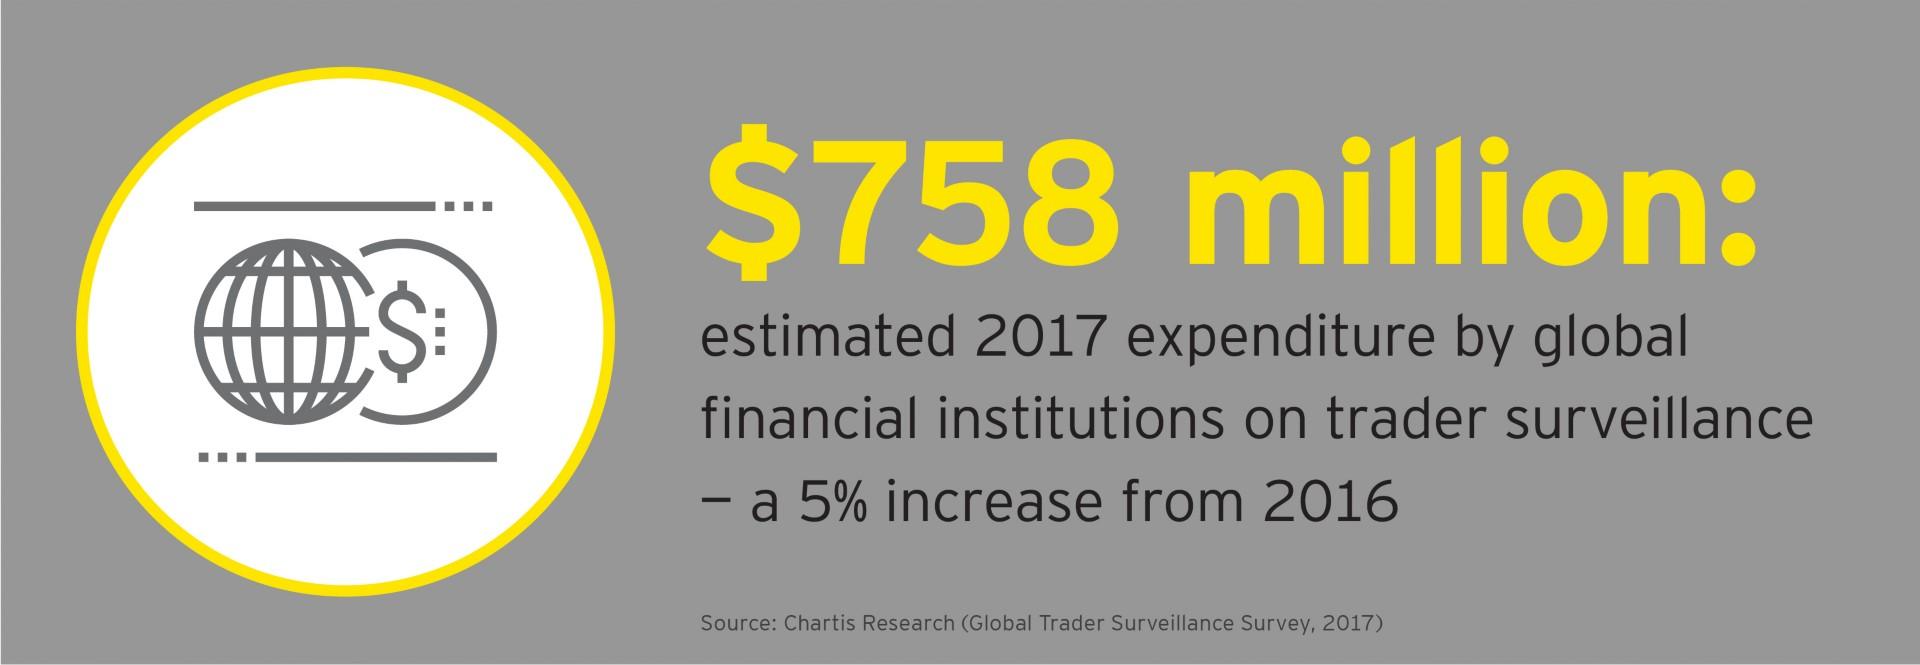 Trader surveillance report image 1